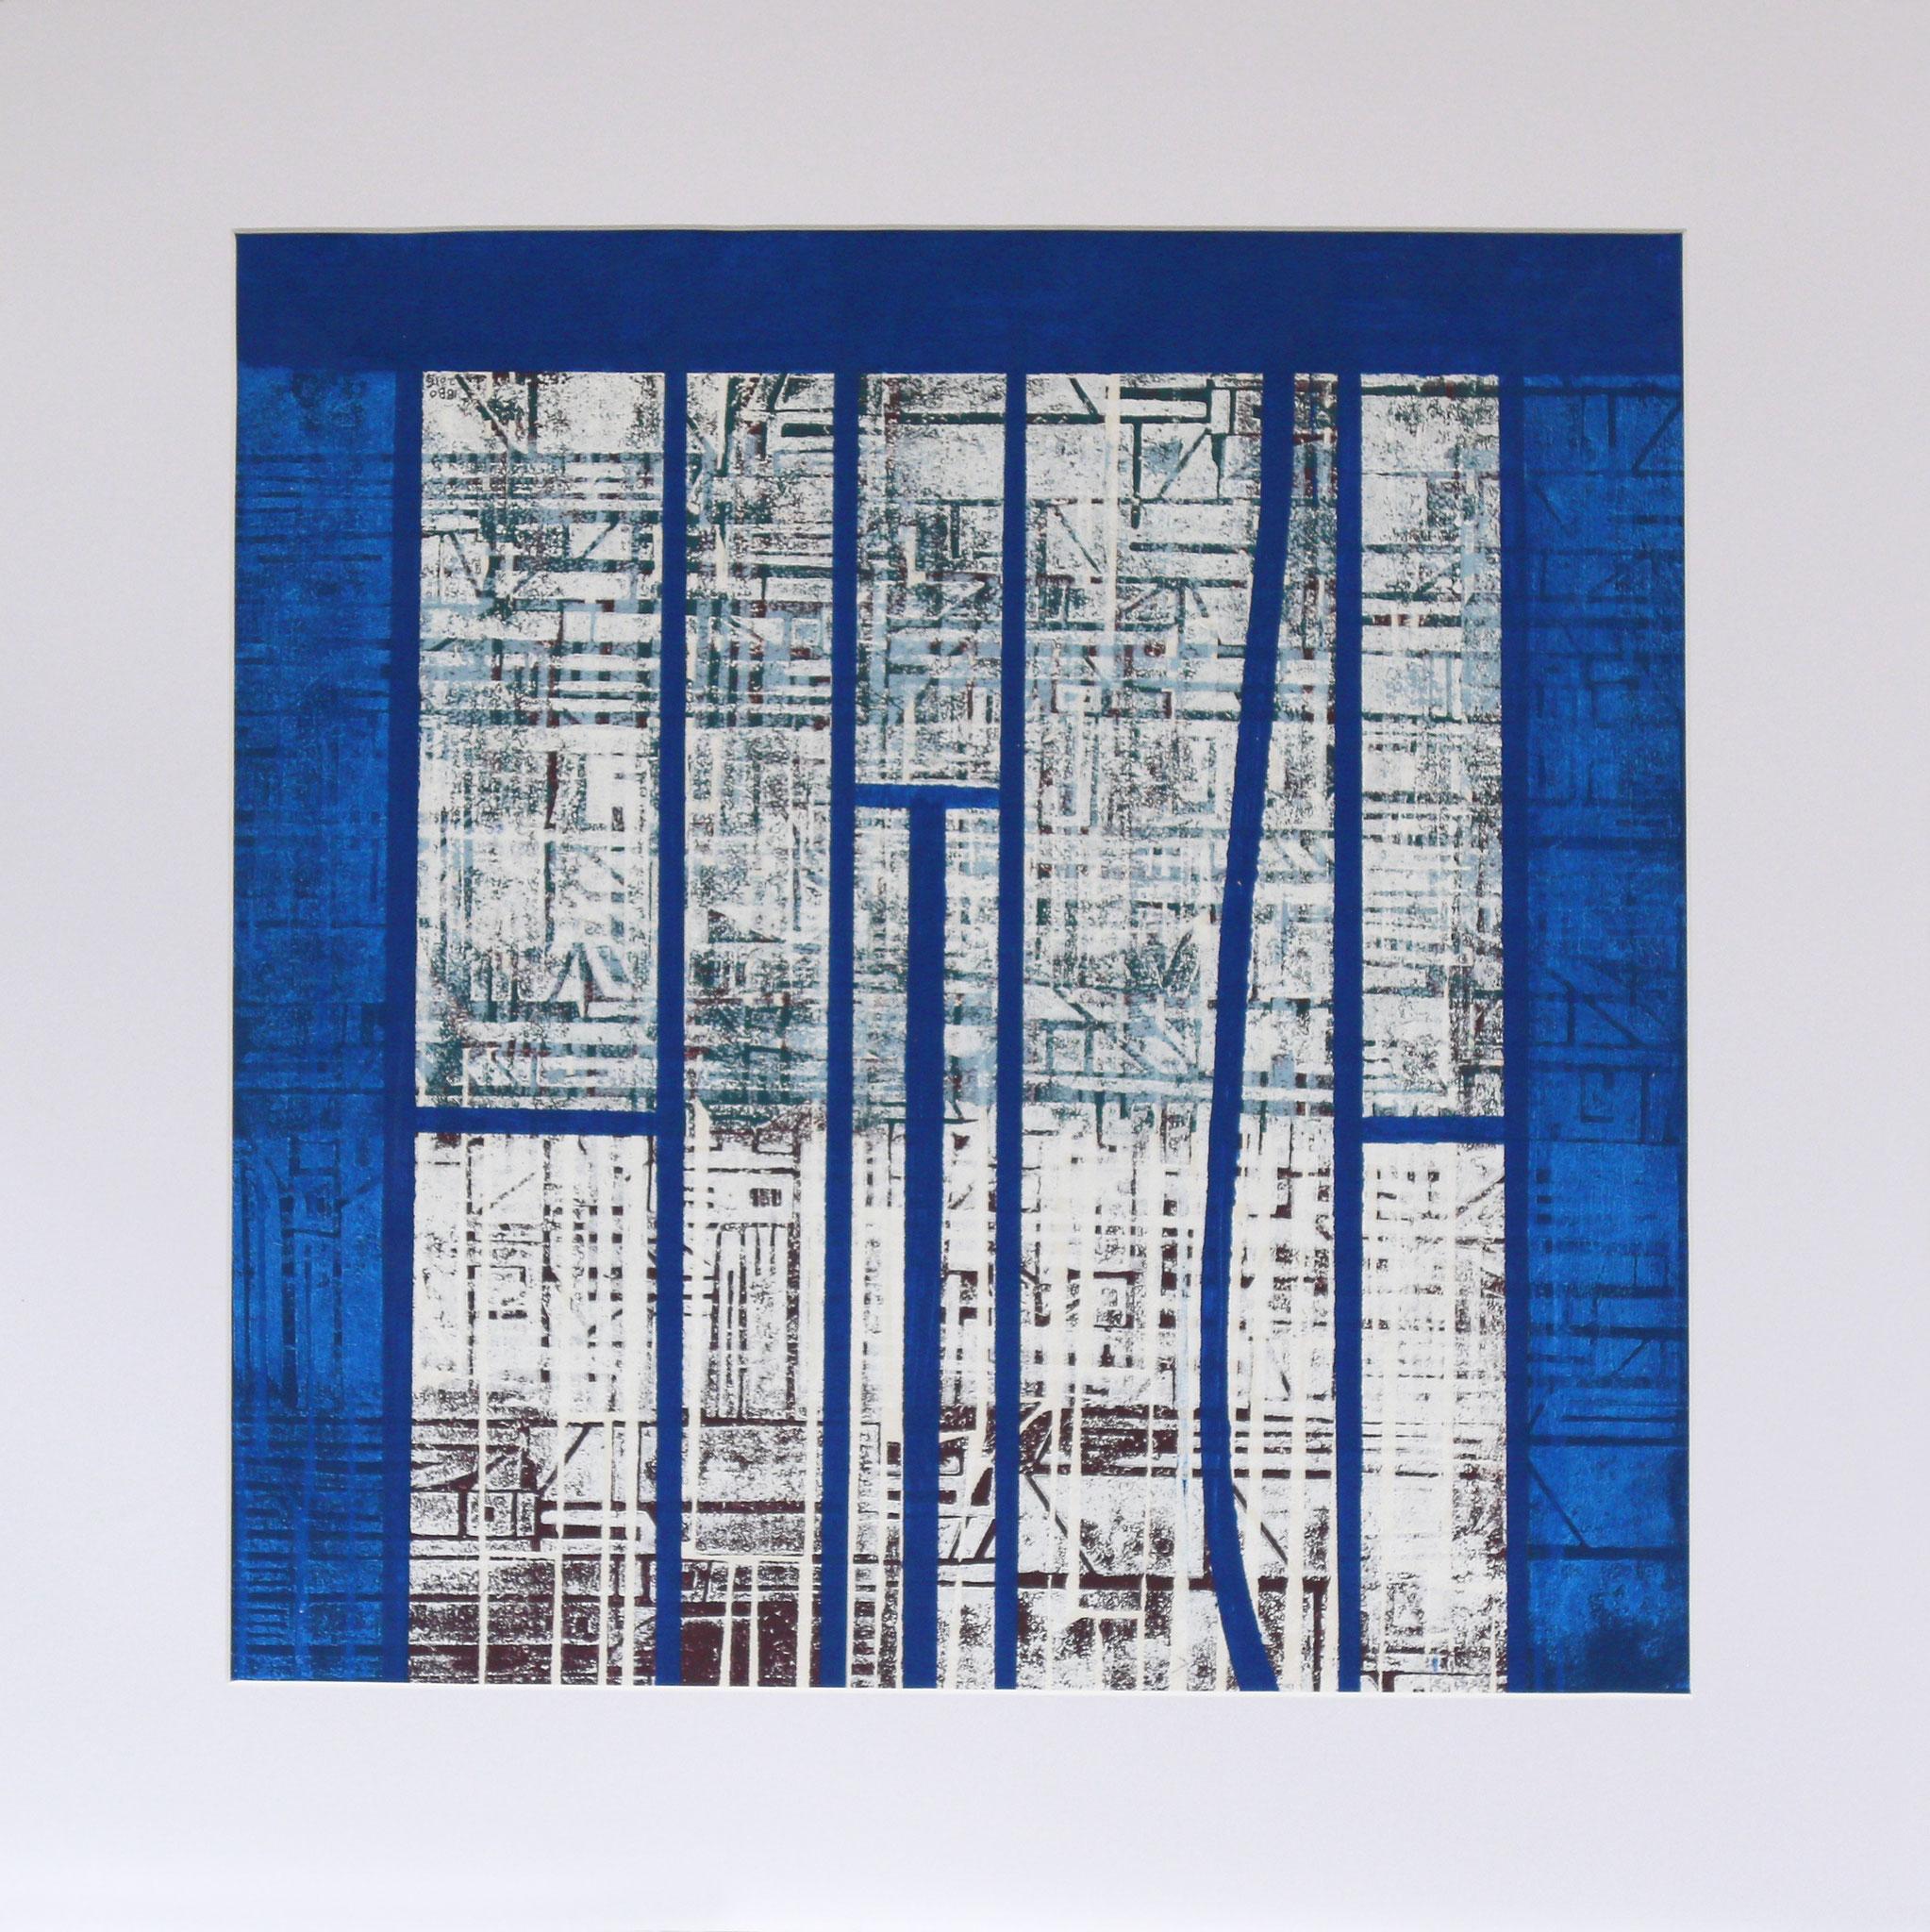 Untitled 53 x 53 cm Mixed media (71 x 71 cm mounted)